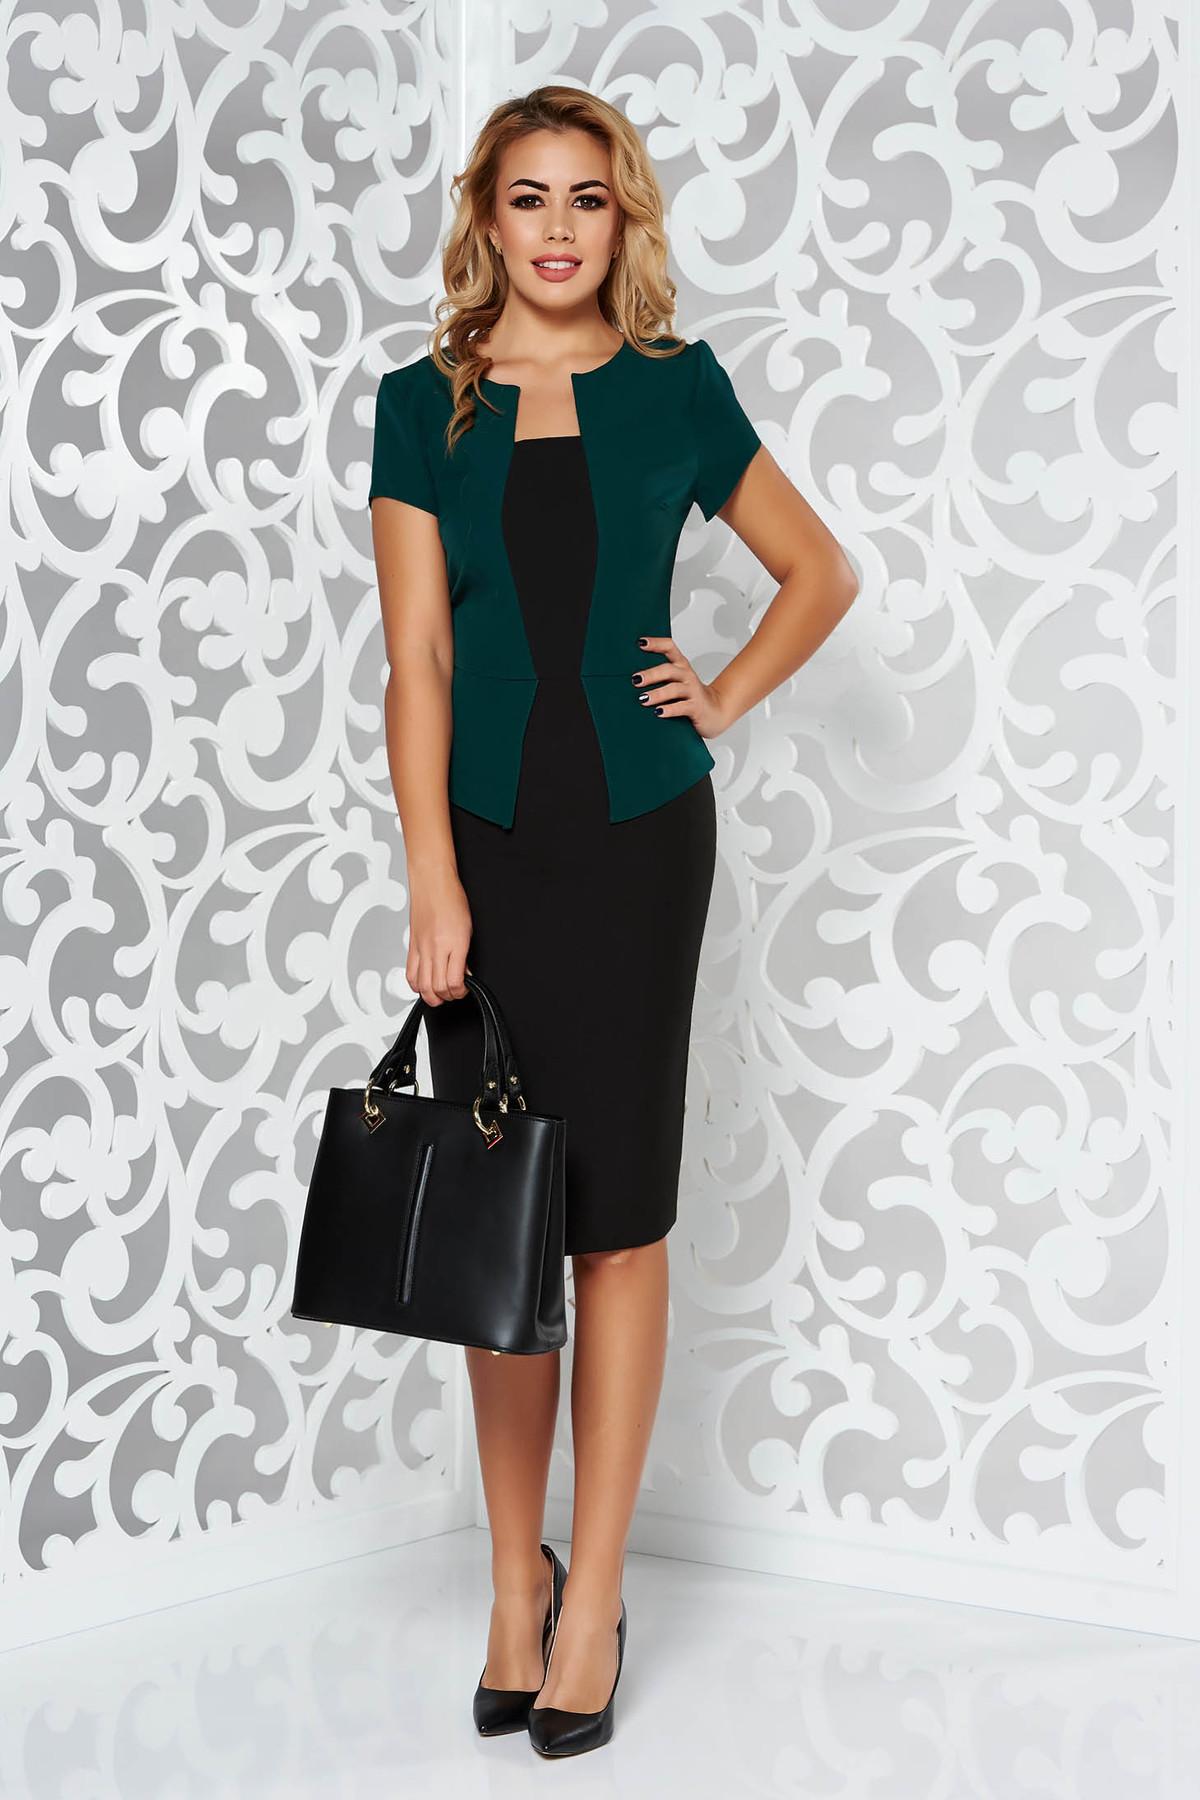 Rochie verde office tip creion din stofa usor elastica cu peplum